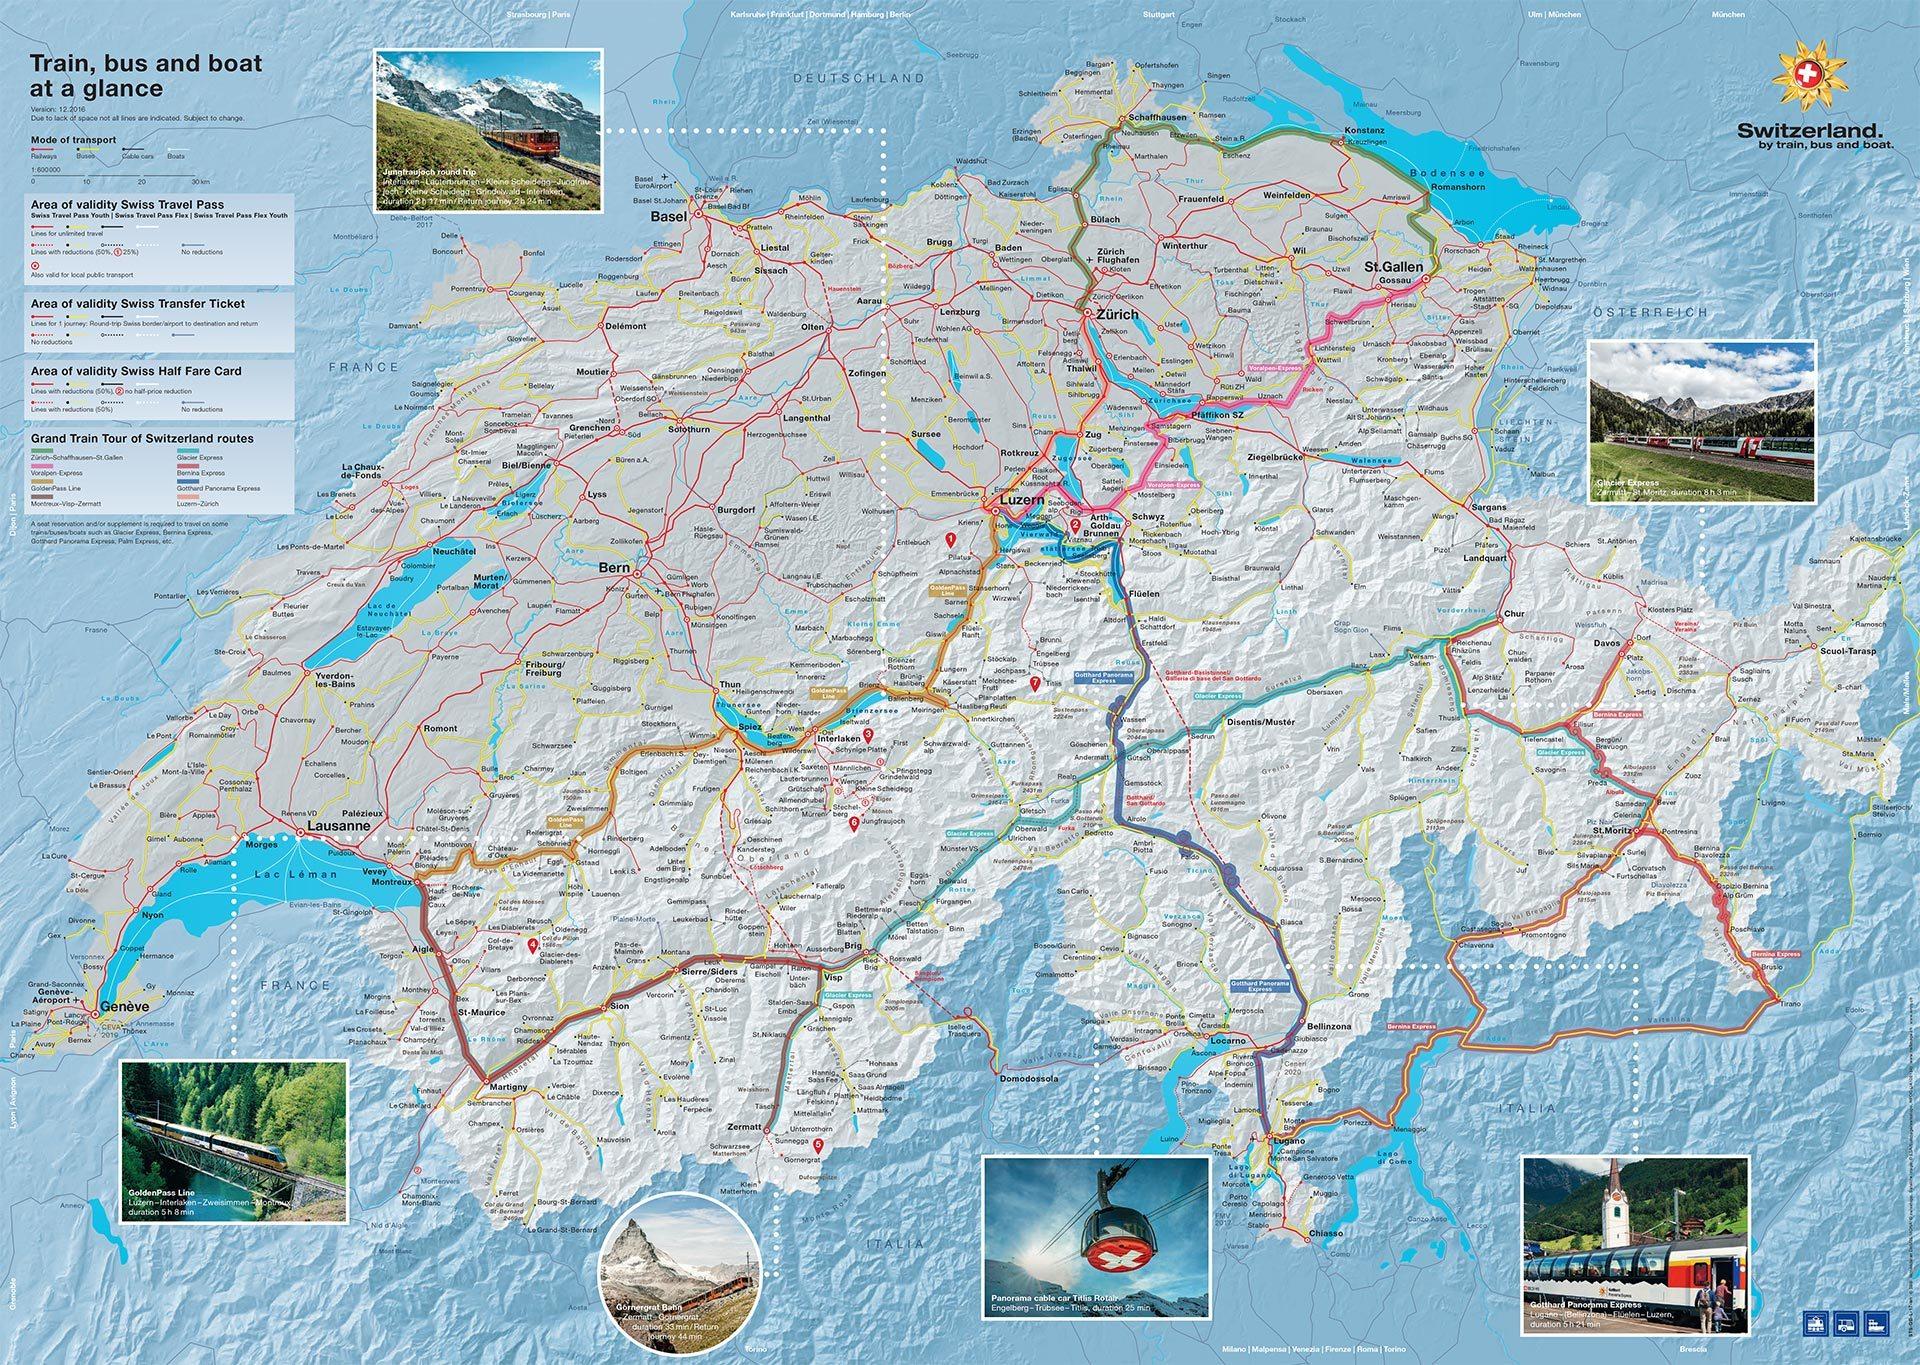 Swiss Railway map (credit: Swissrailways.com)